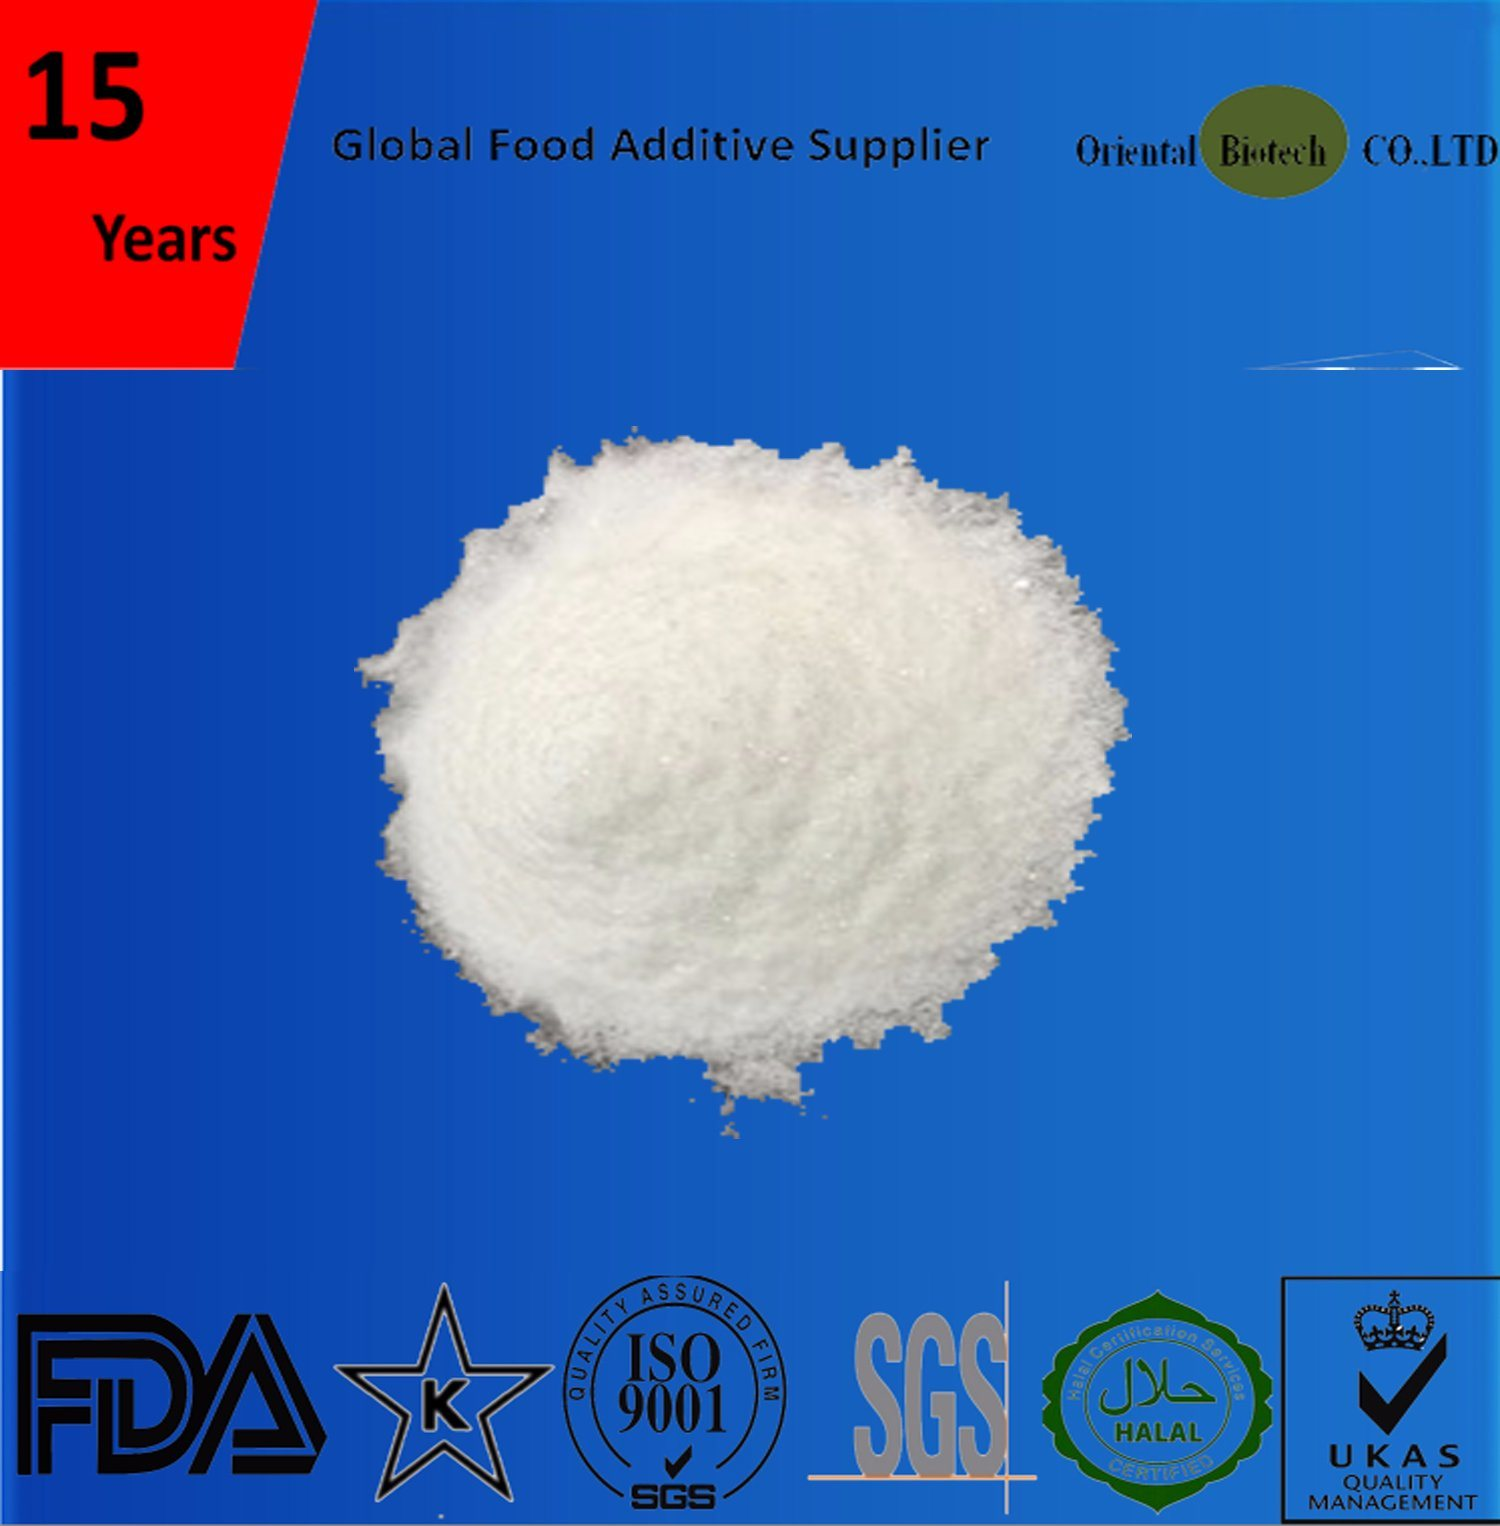 Hot Sell Food Sweetener Aspartame Powder 20-100mesh